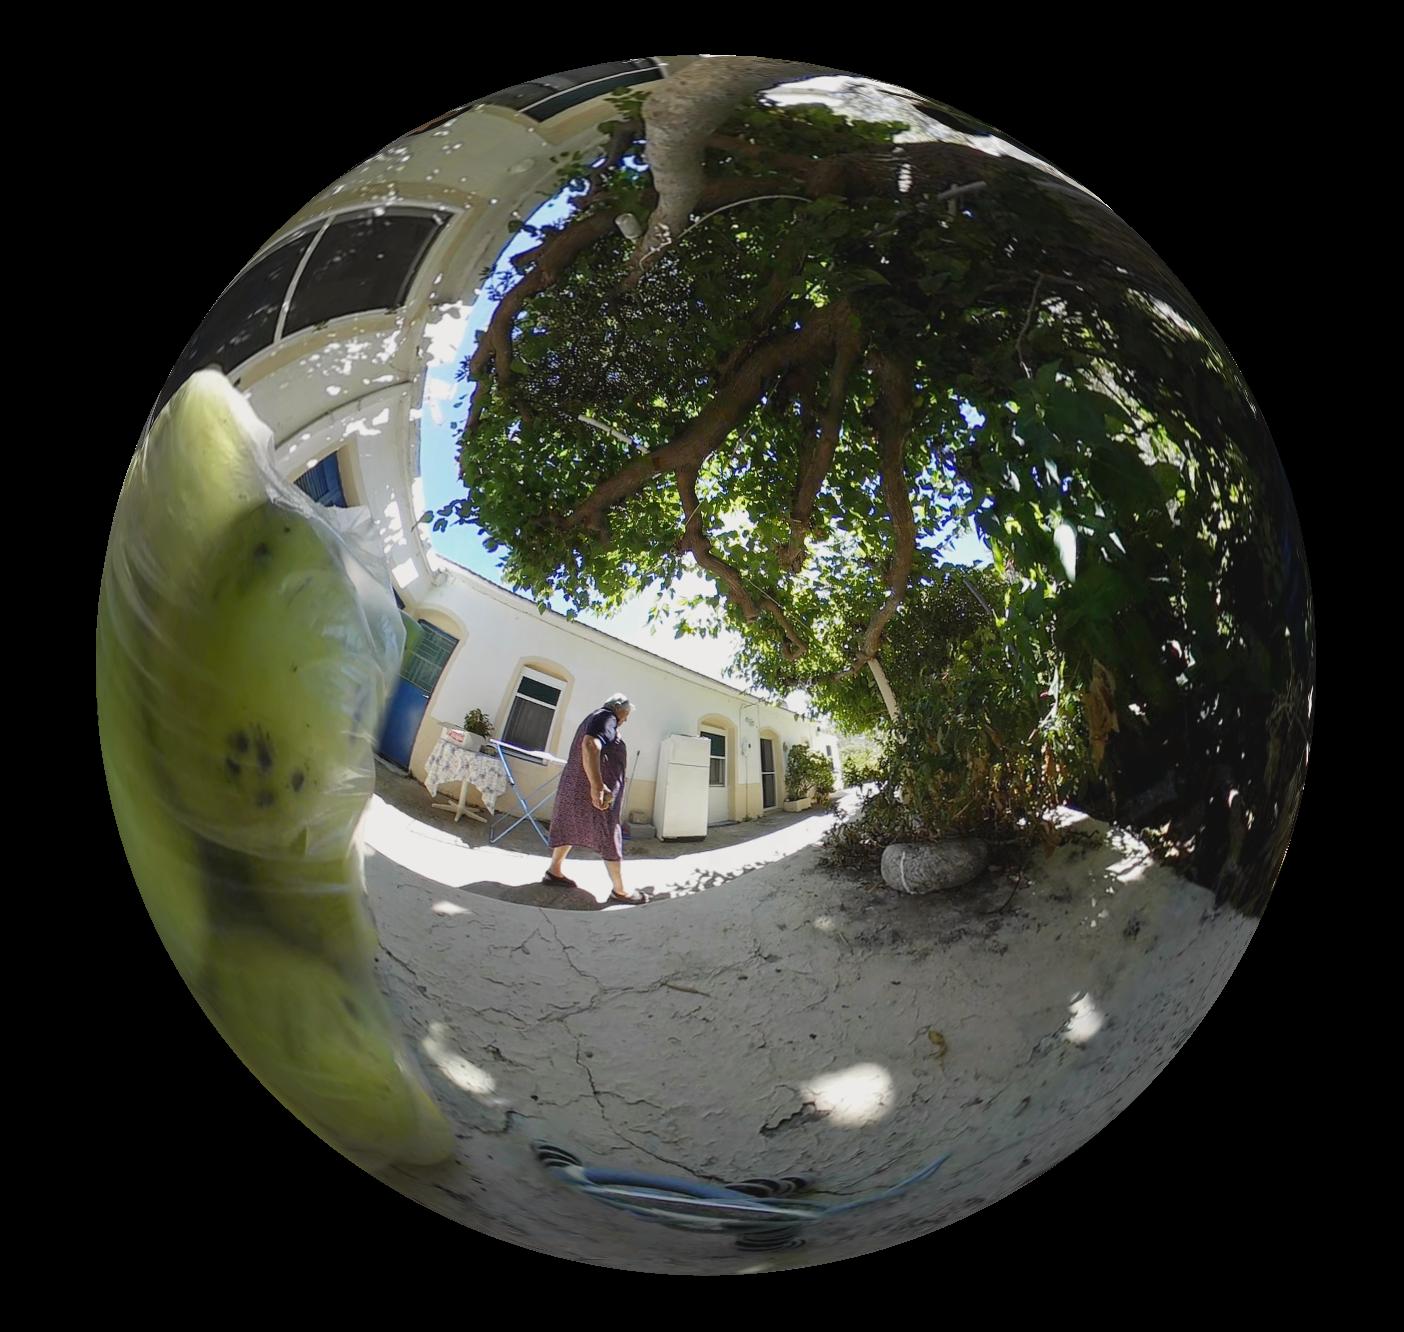 blue zone ikaria filming 360 virtual reality vr older woman generation longevity